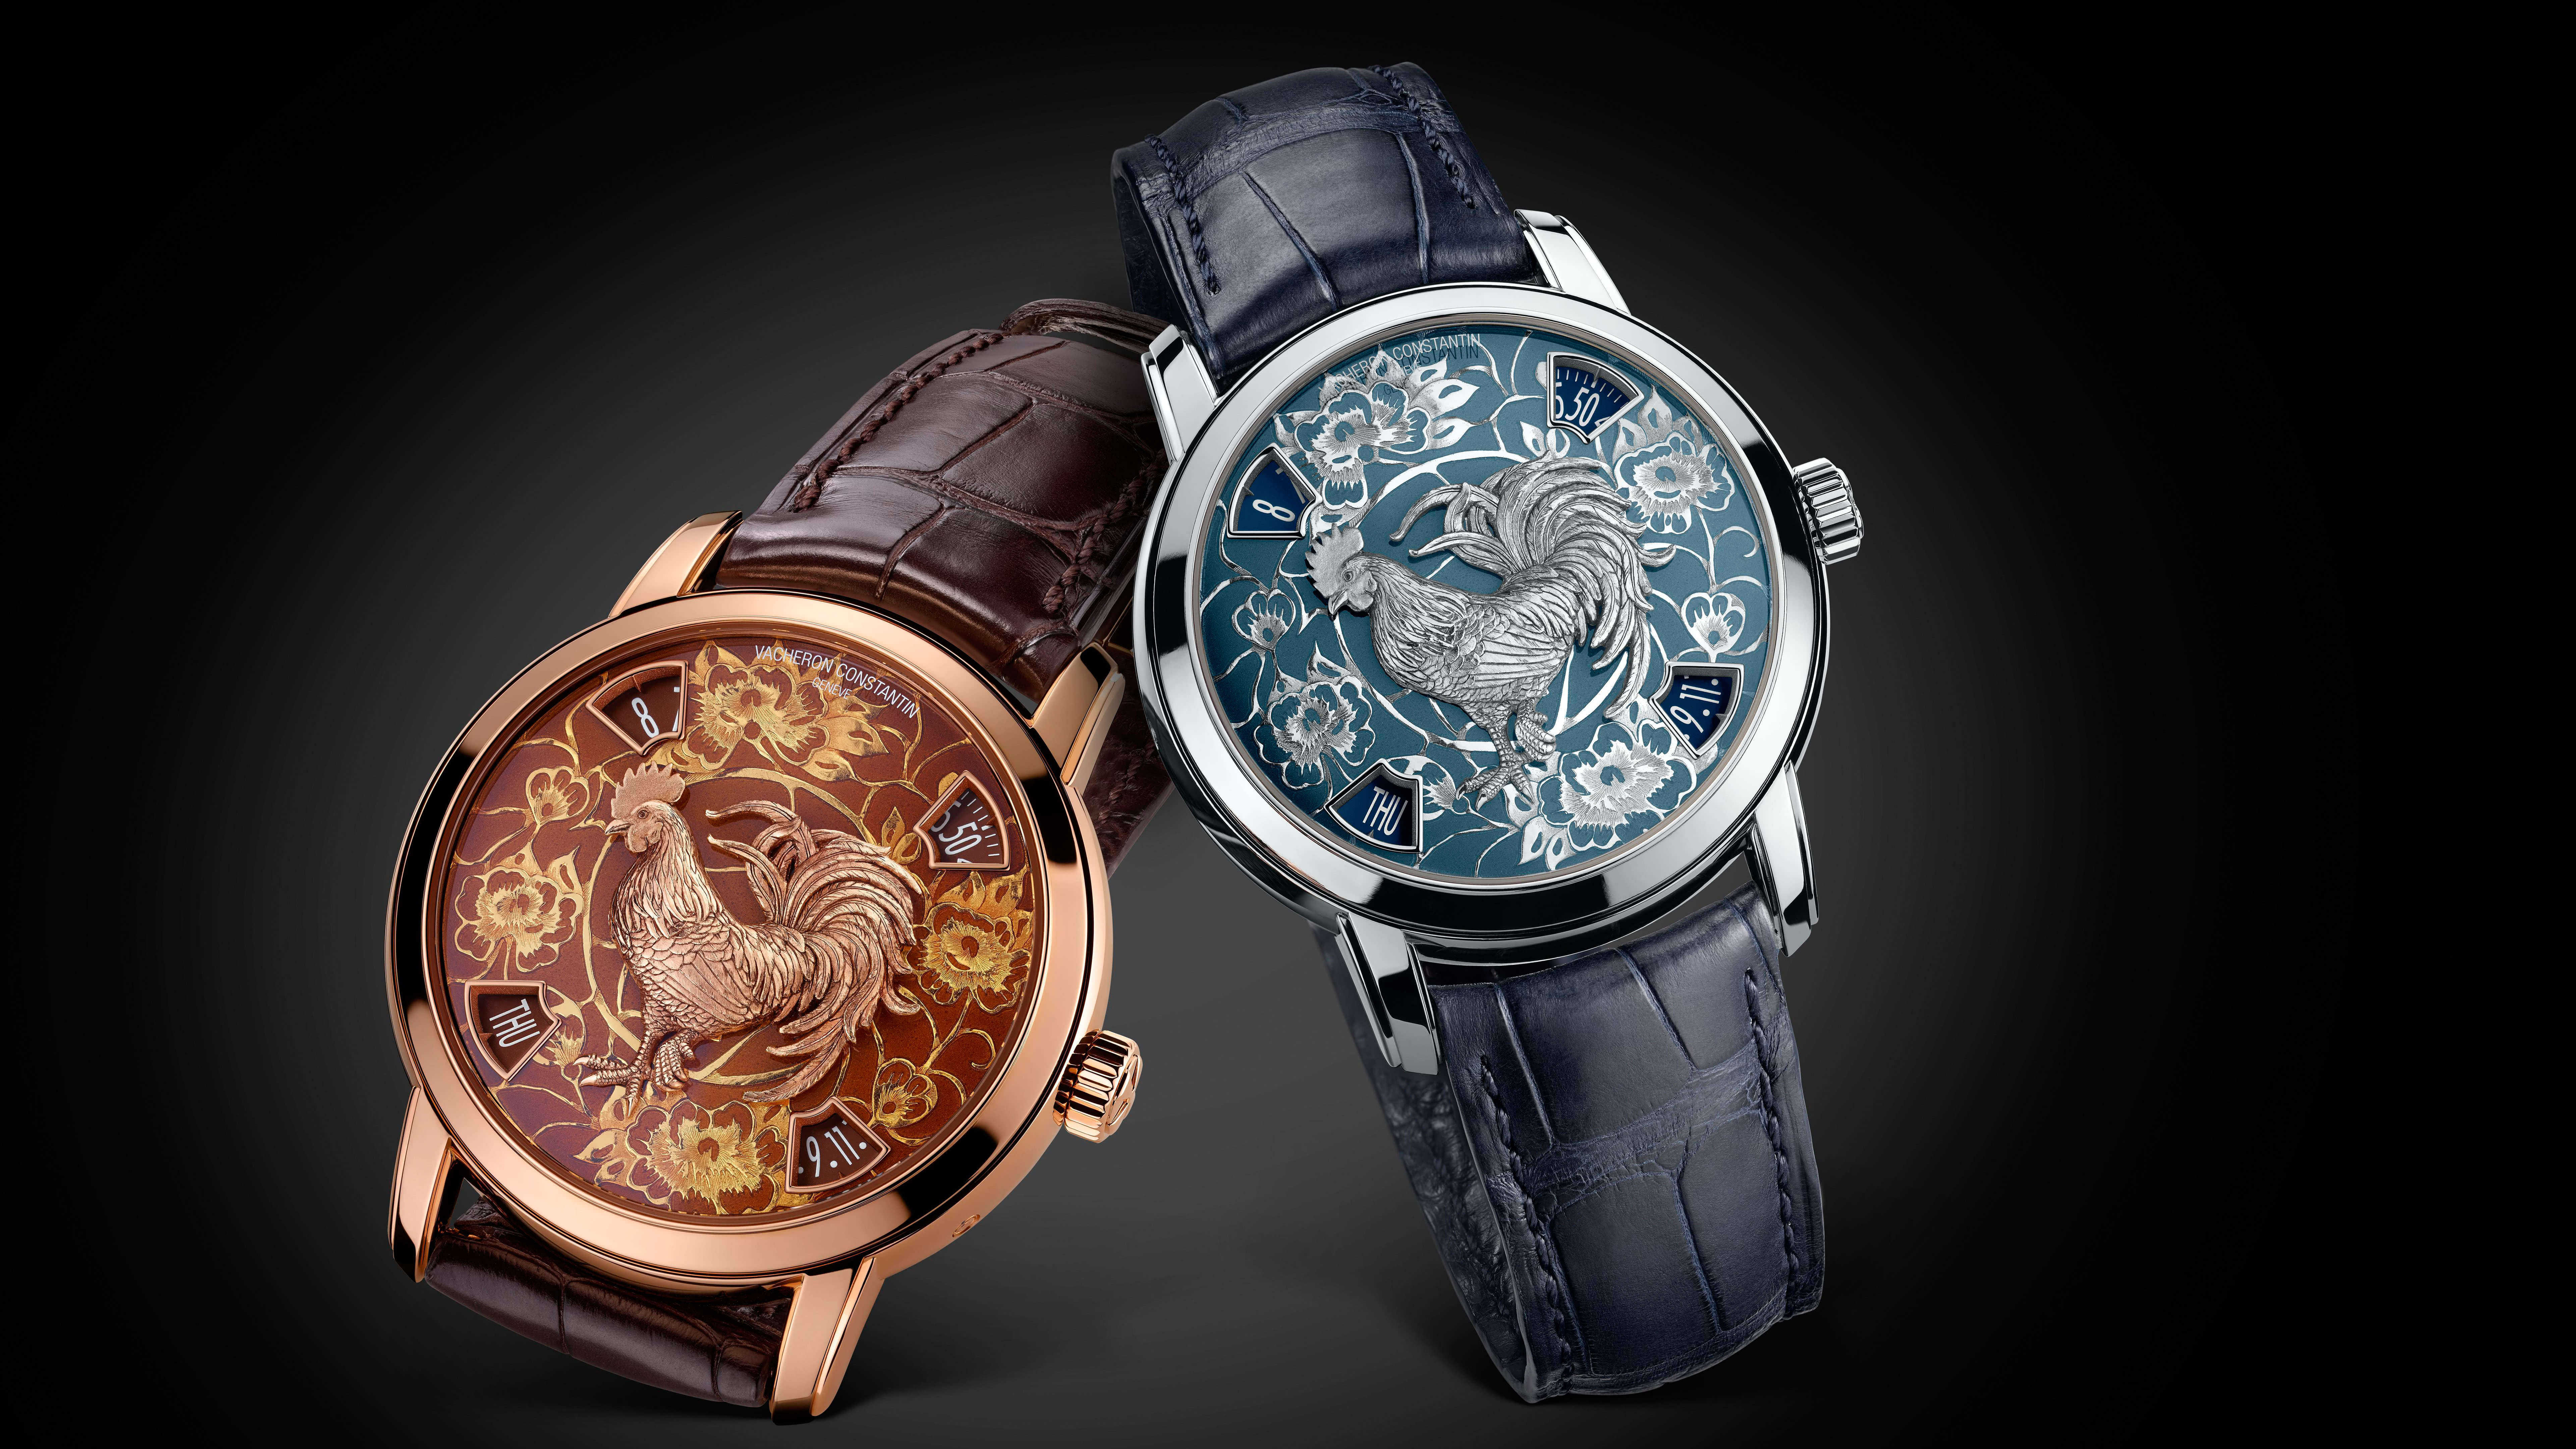 vacheron constantin watches legend of the chinese zodiac uhd 8k wallpaper